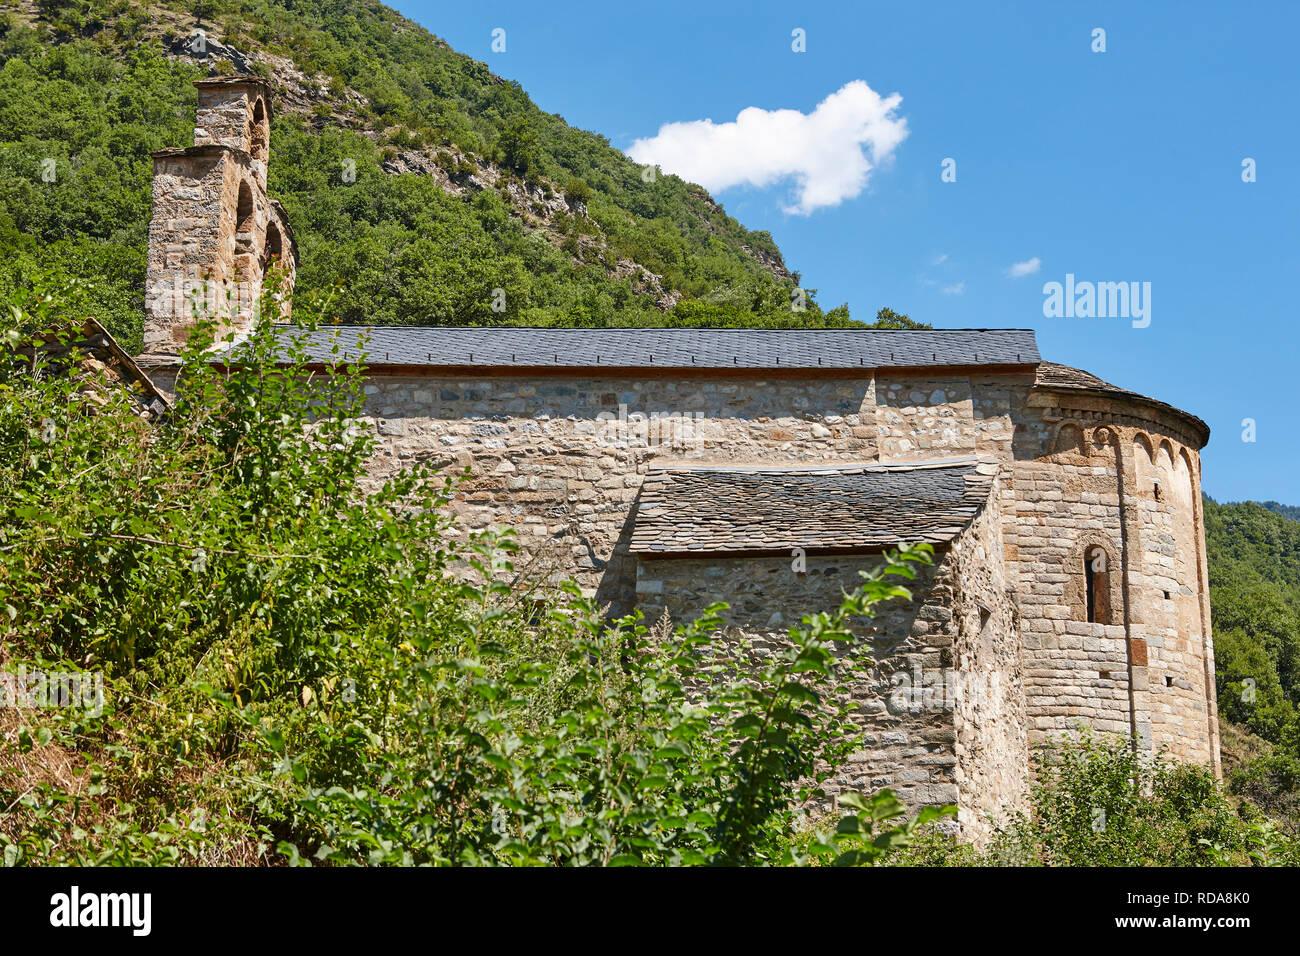 Spanish romanesque art. Santa Maria Cardet church. Boi valley. Catalonia - Stock Image